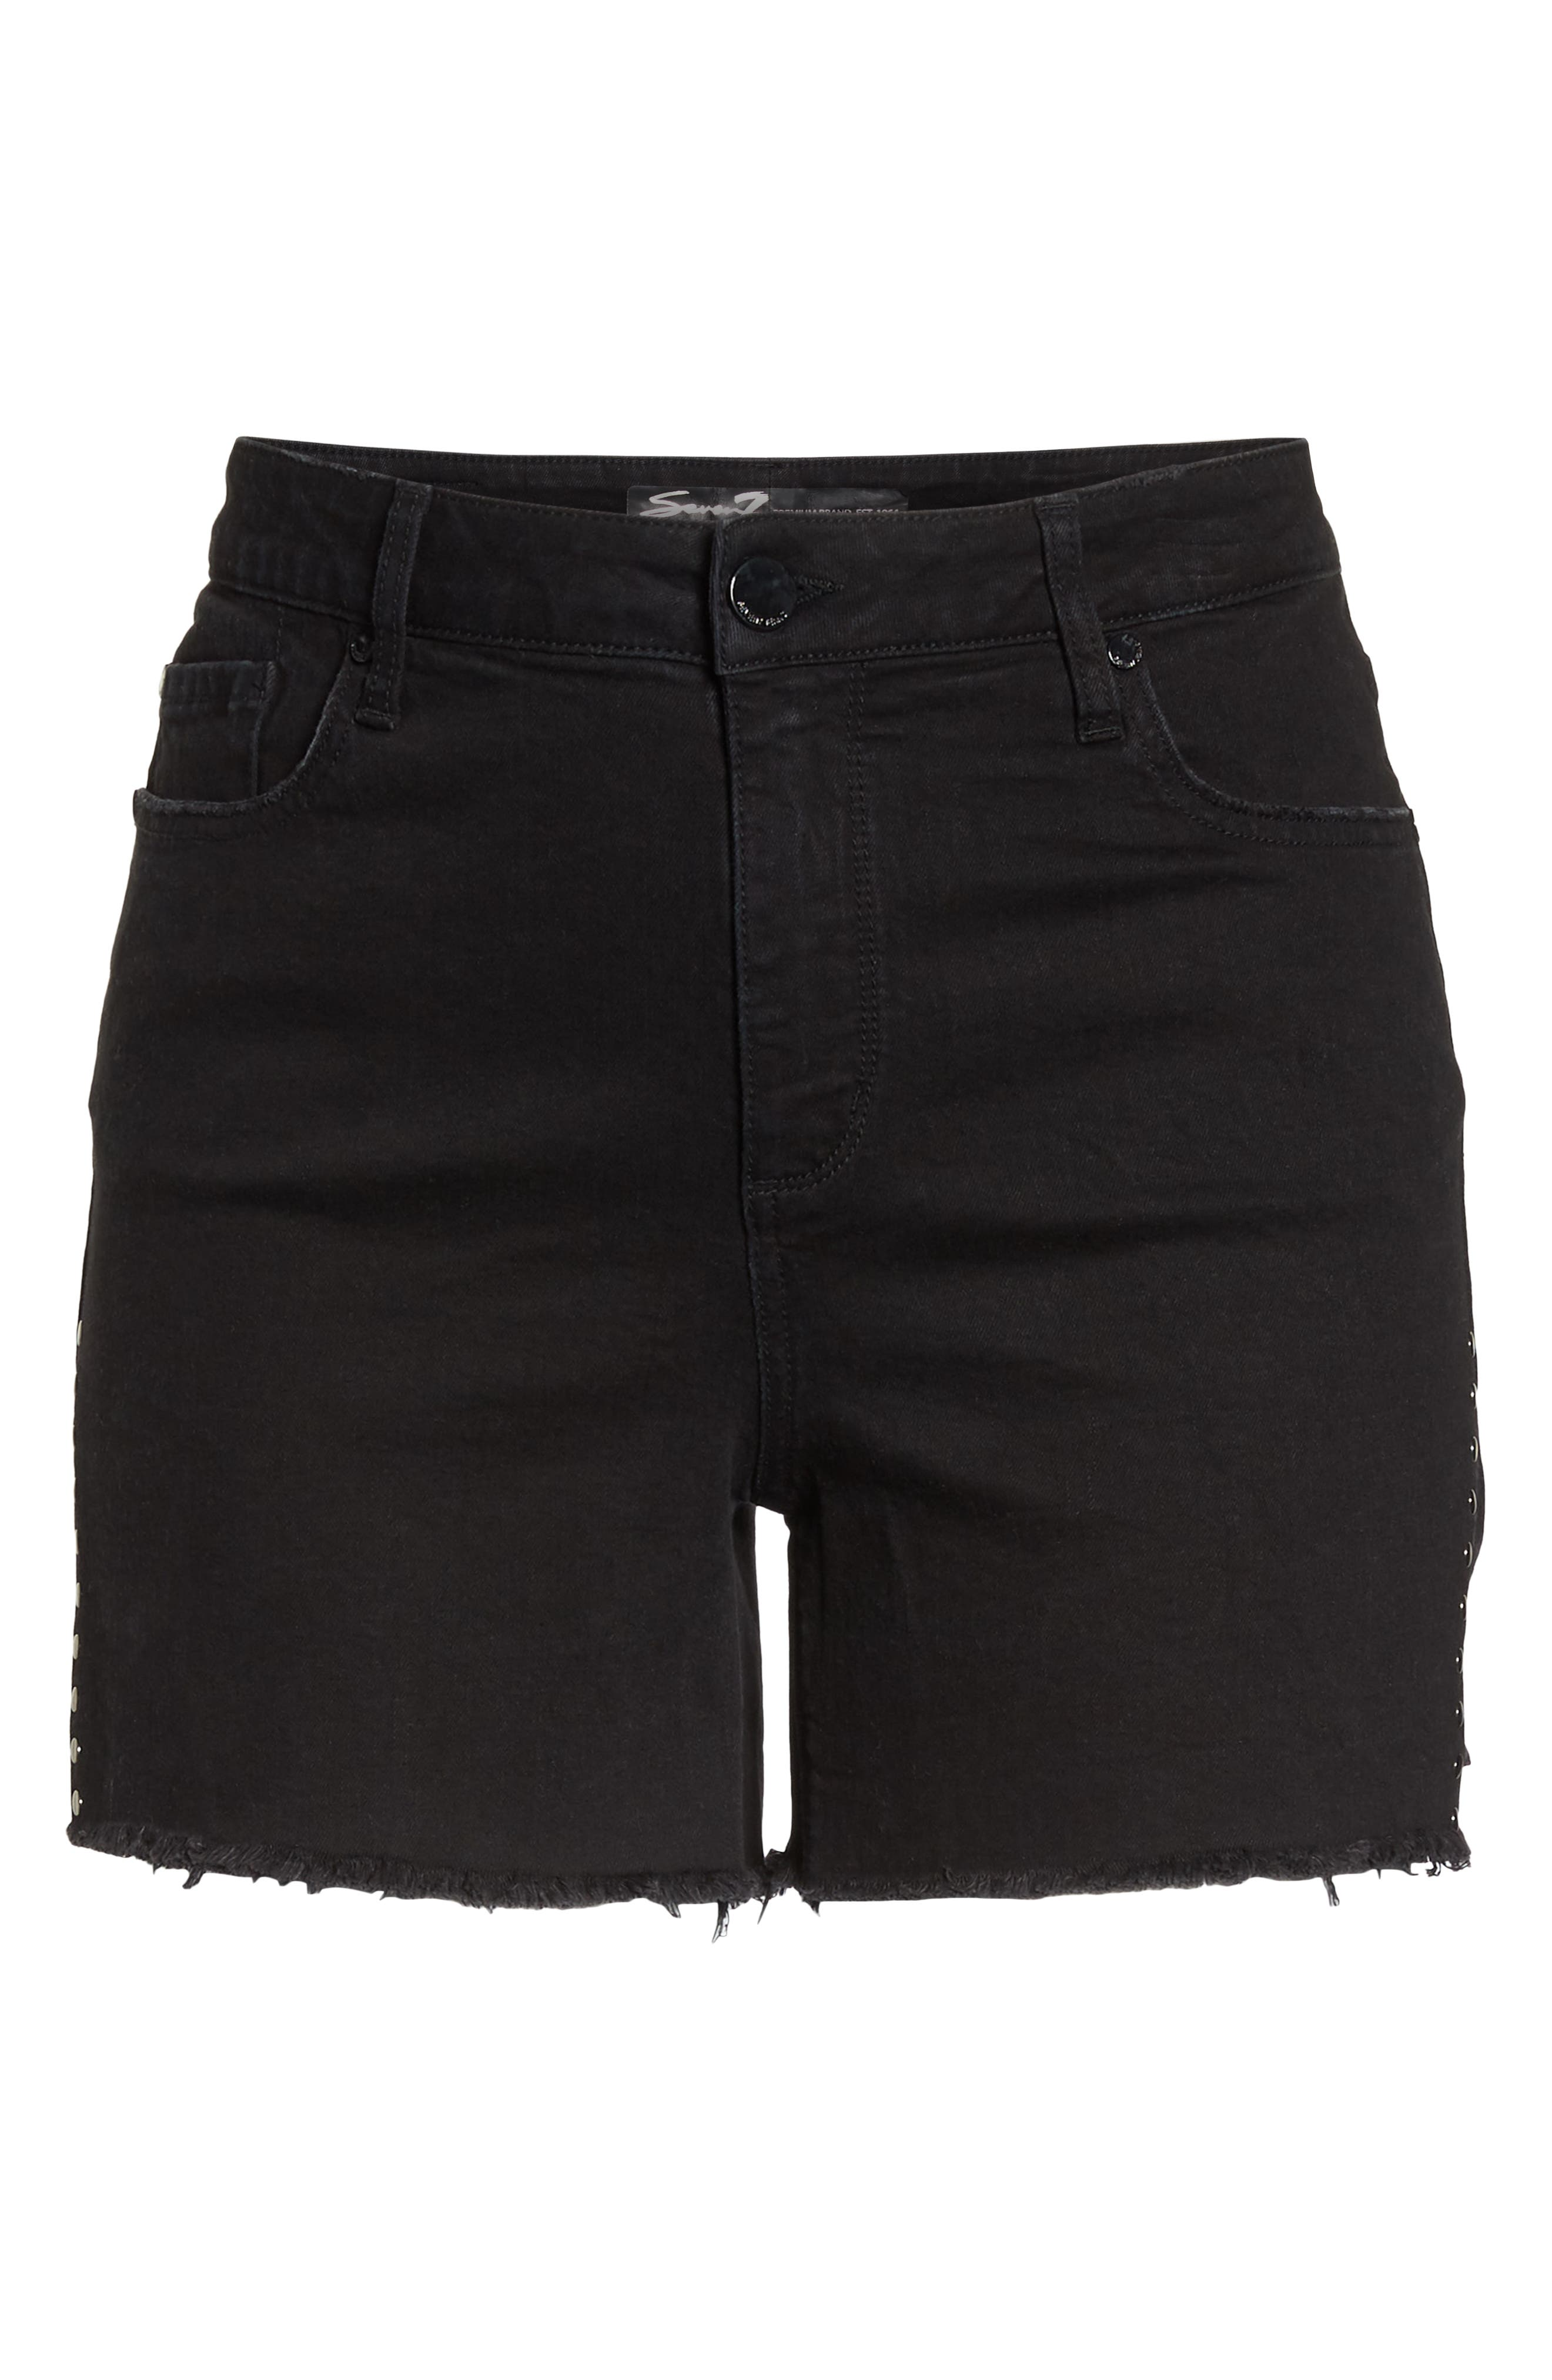 SEVEN7,                             High Rise Stud Detail Denim Shorts,                             Alternate thumbnail 7, color,                             CYCLONE